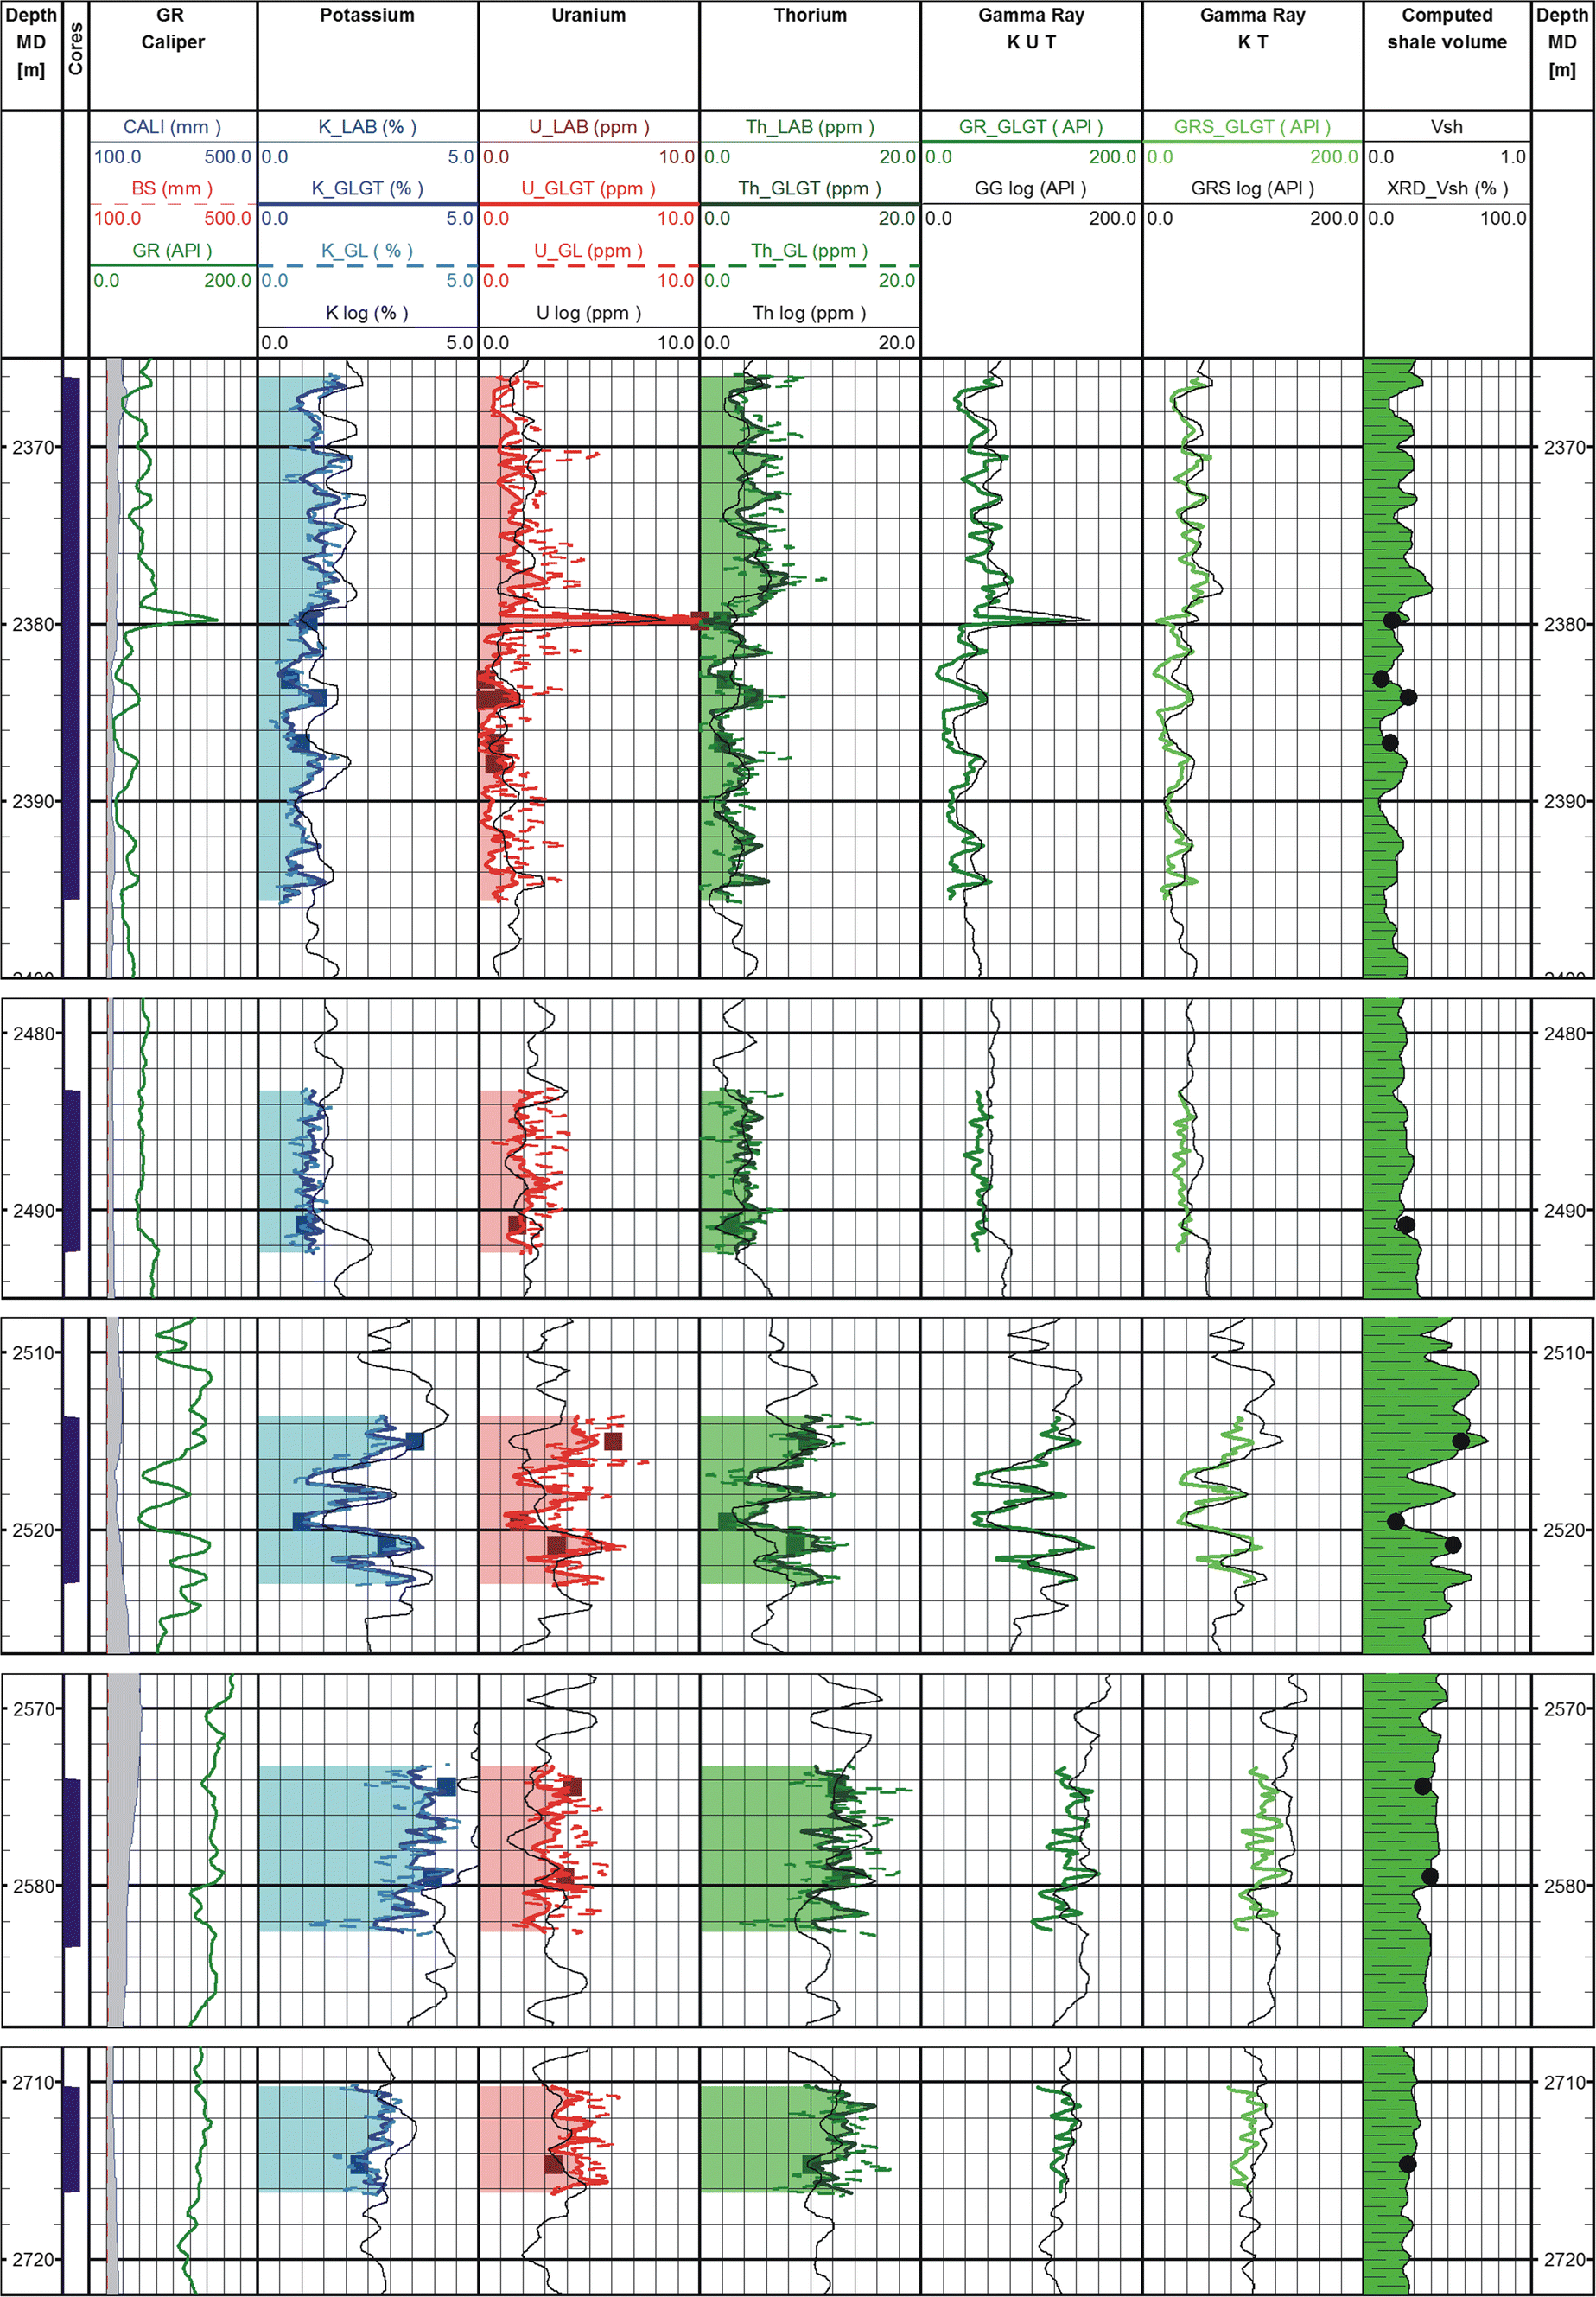 Archival gamma ray logs standardization by nondestructive